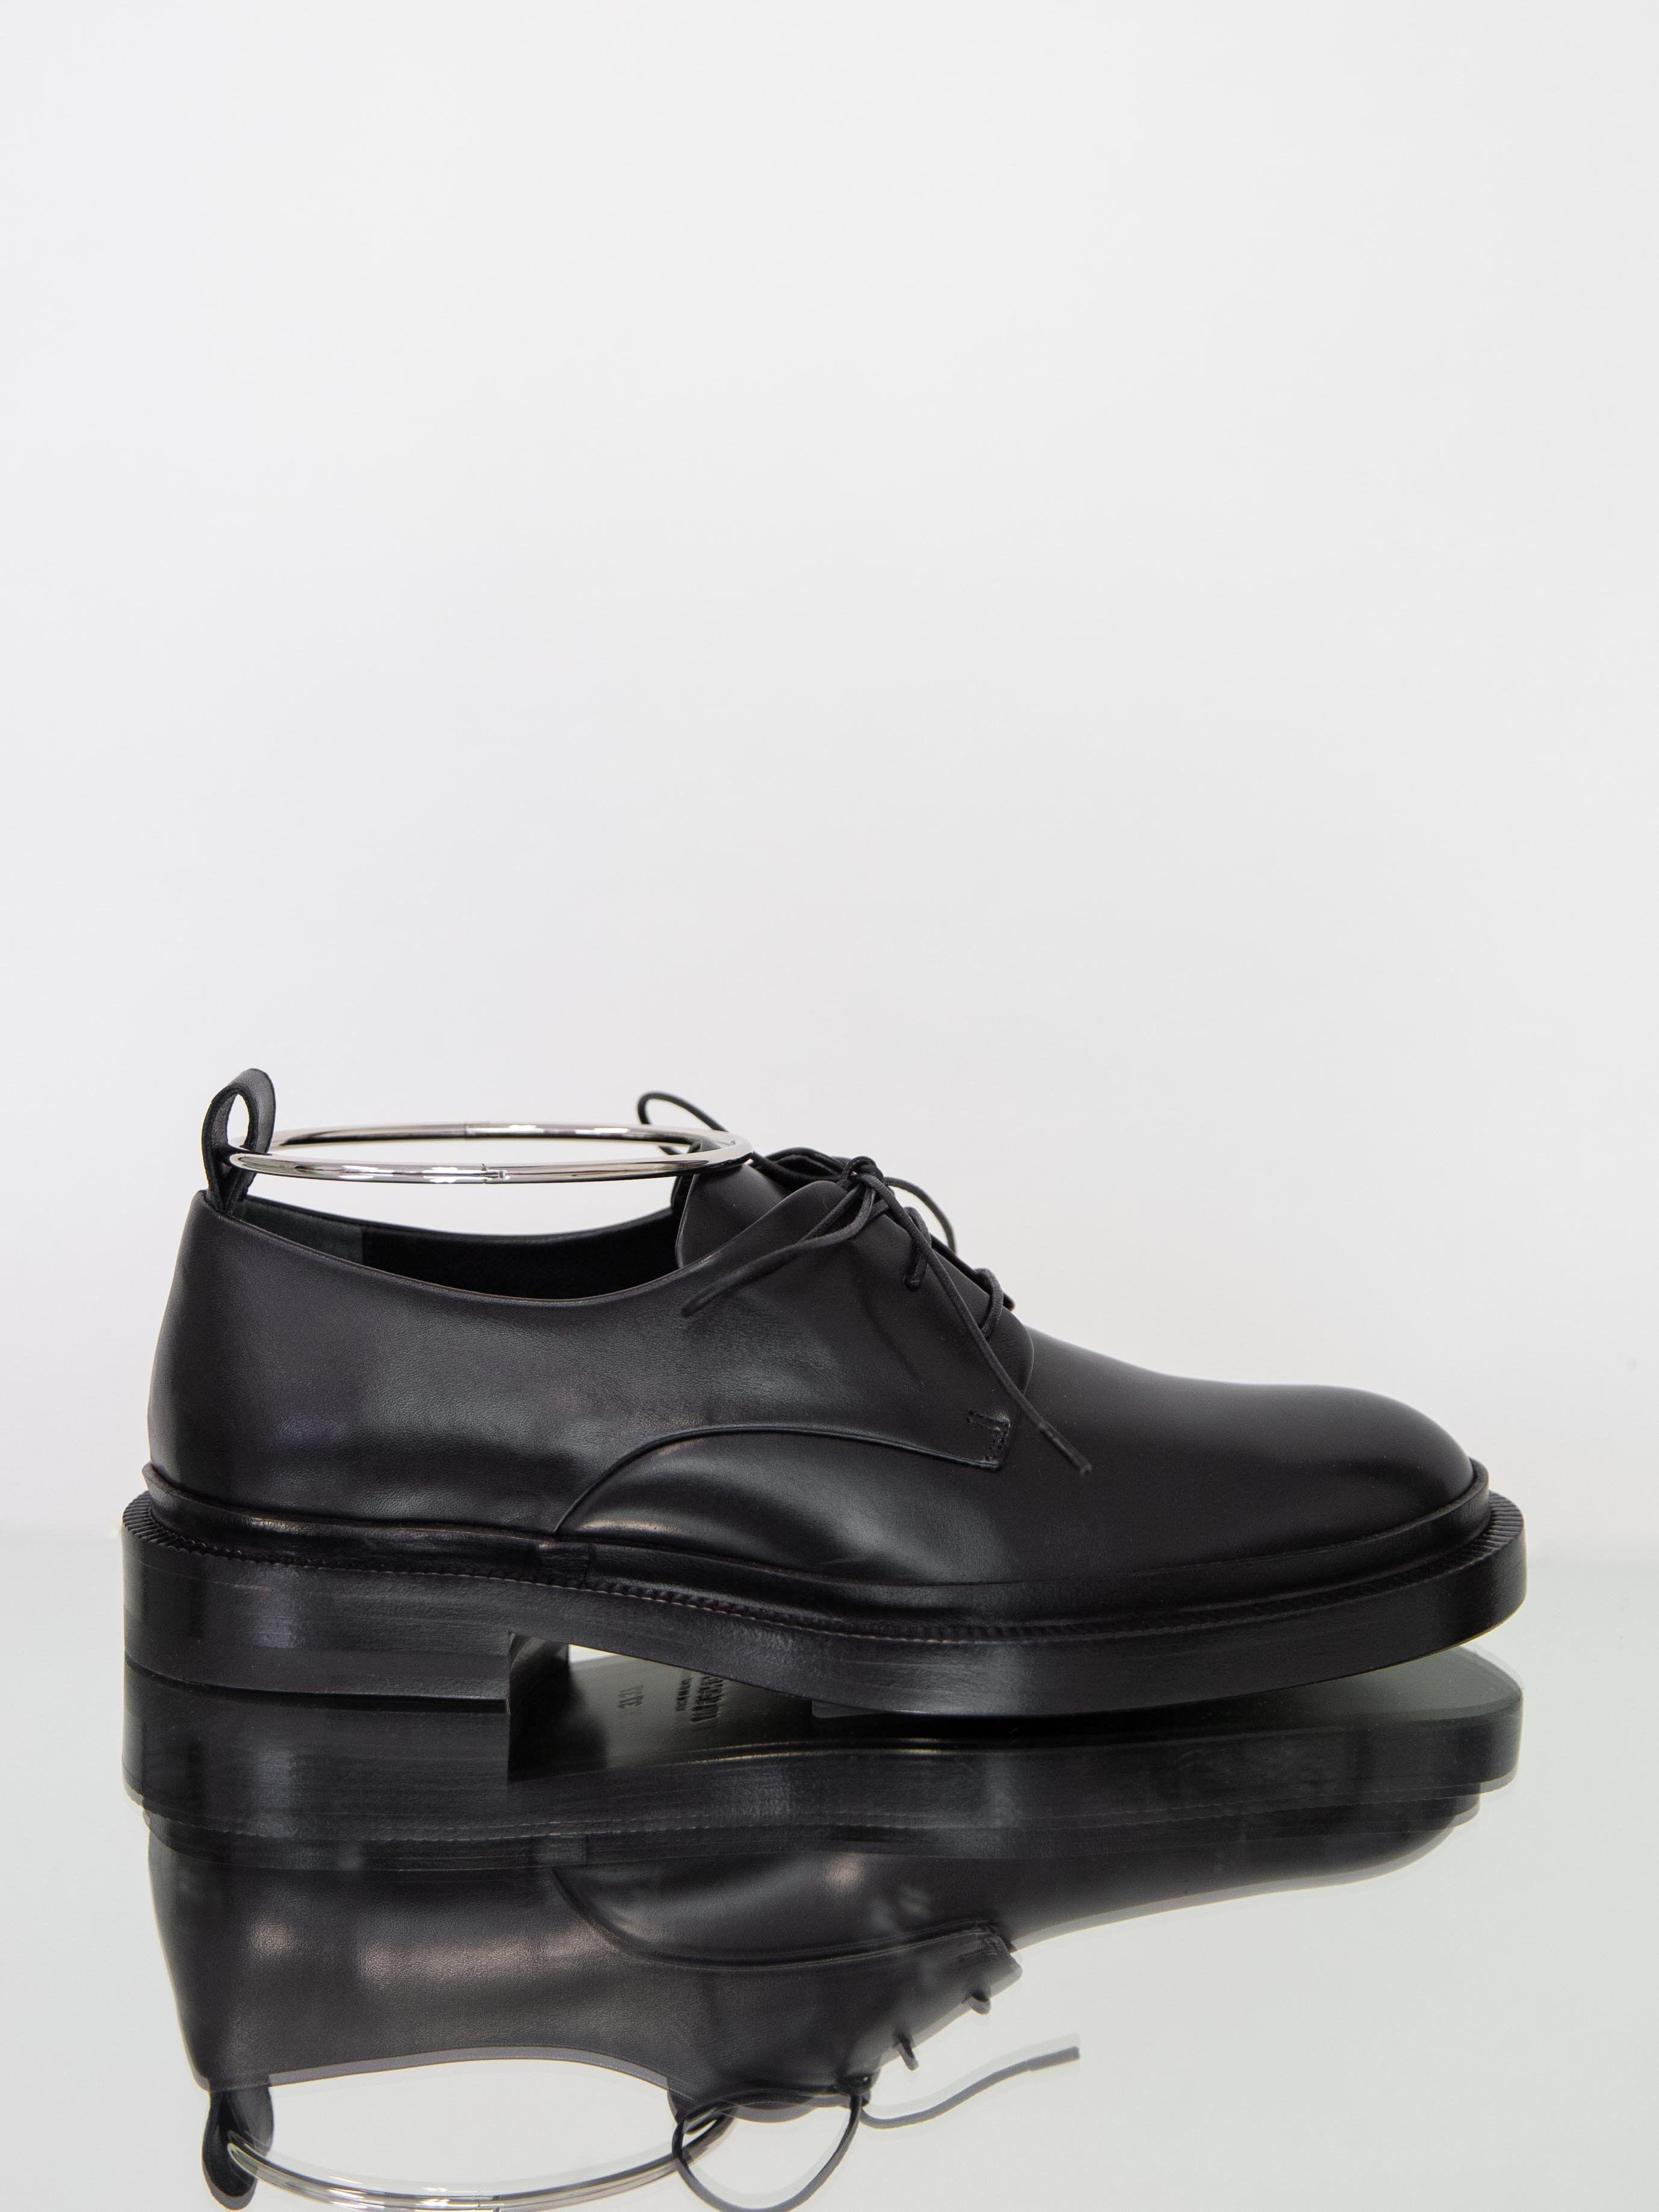 JIL SANDER Lace Up Derby Shoe with